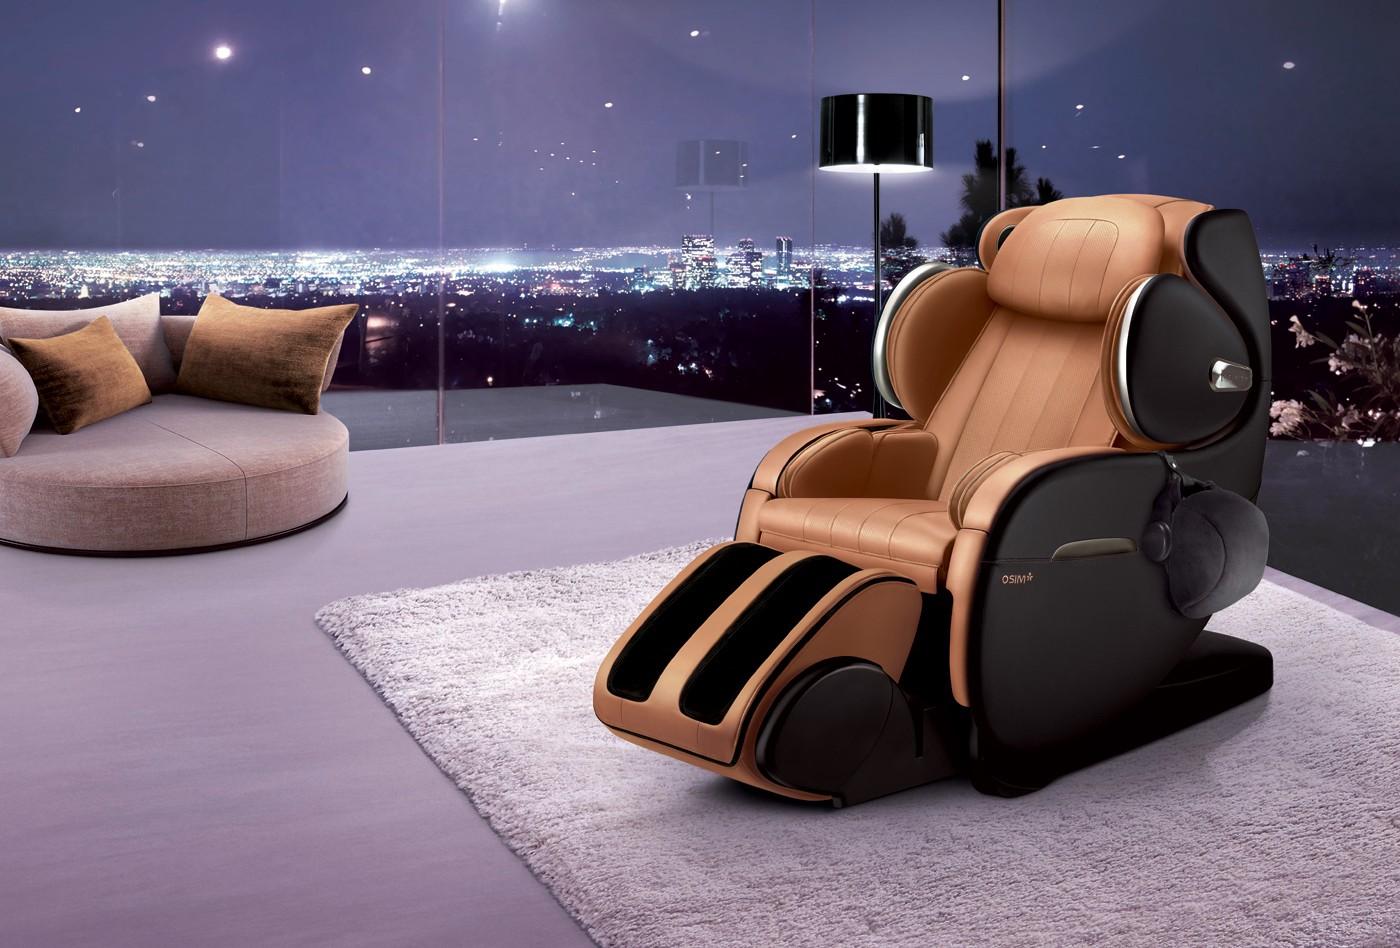 extended free chair infinity zero gravity warranty it massage